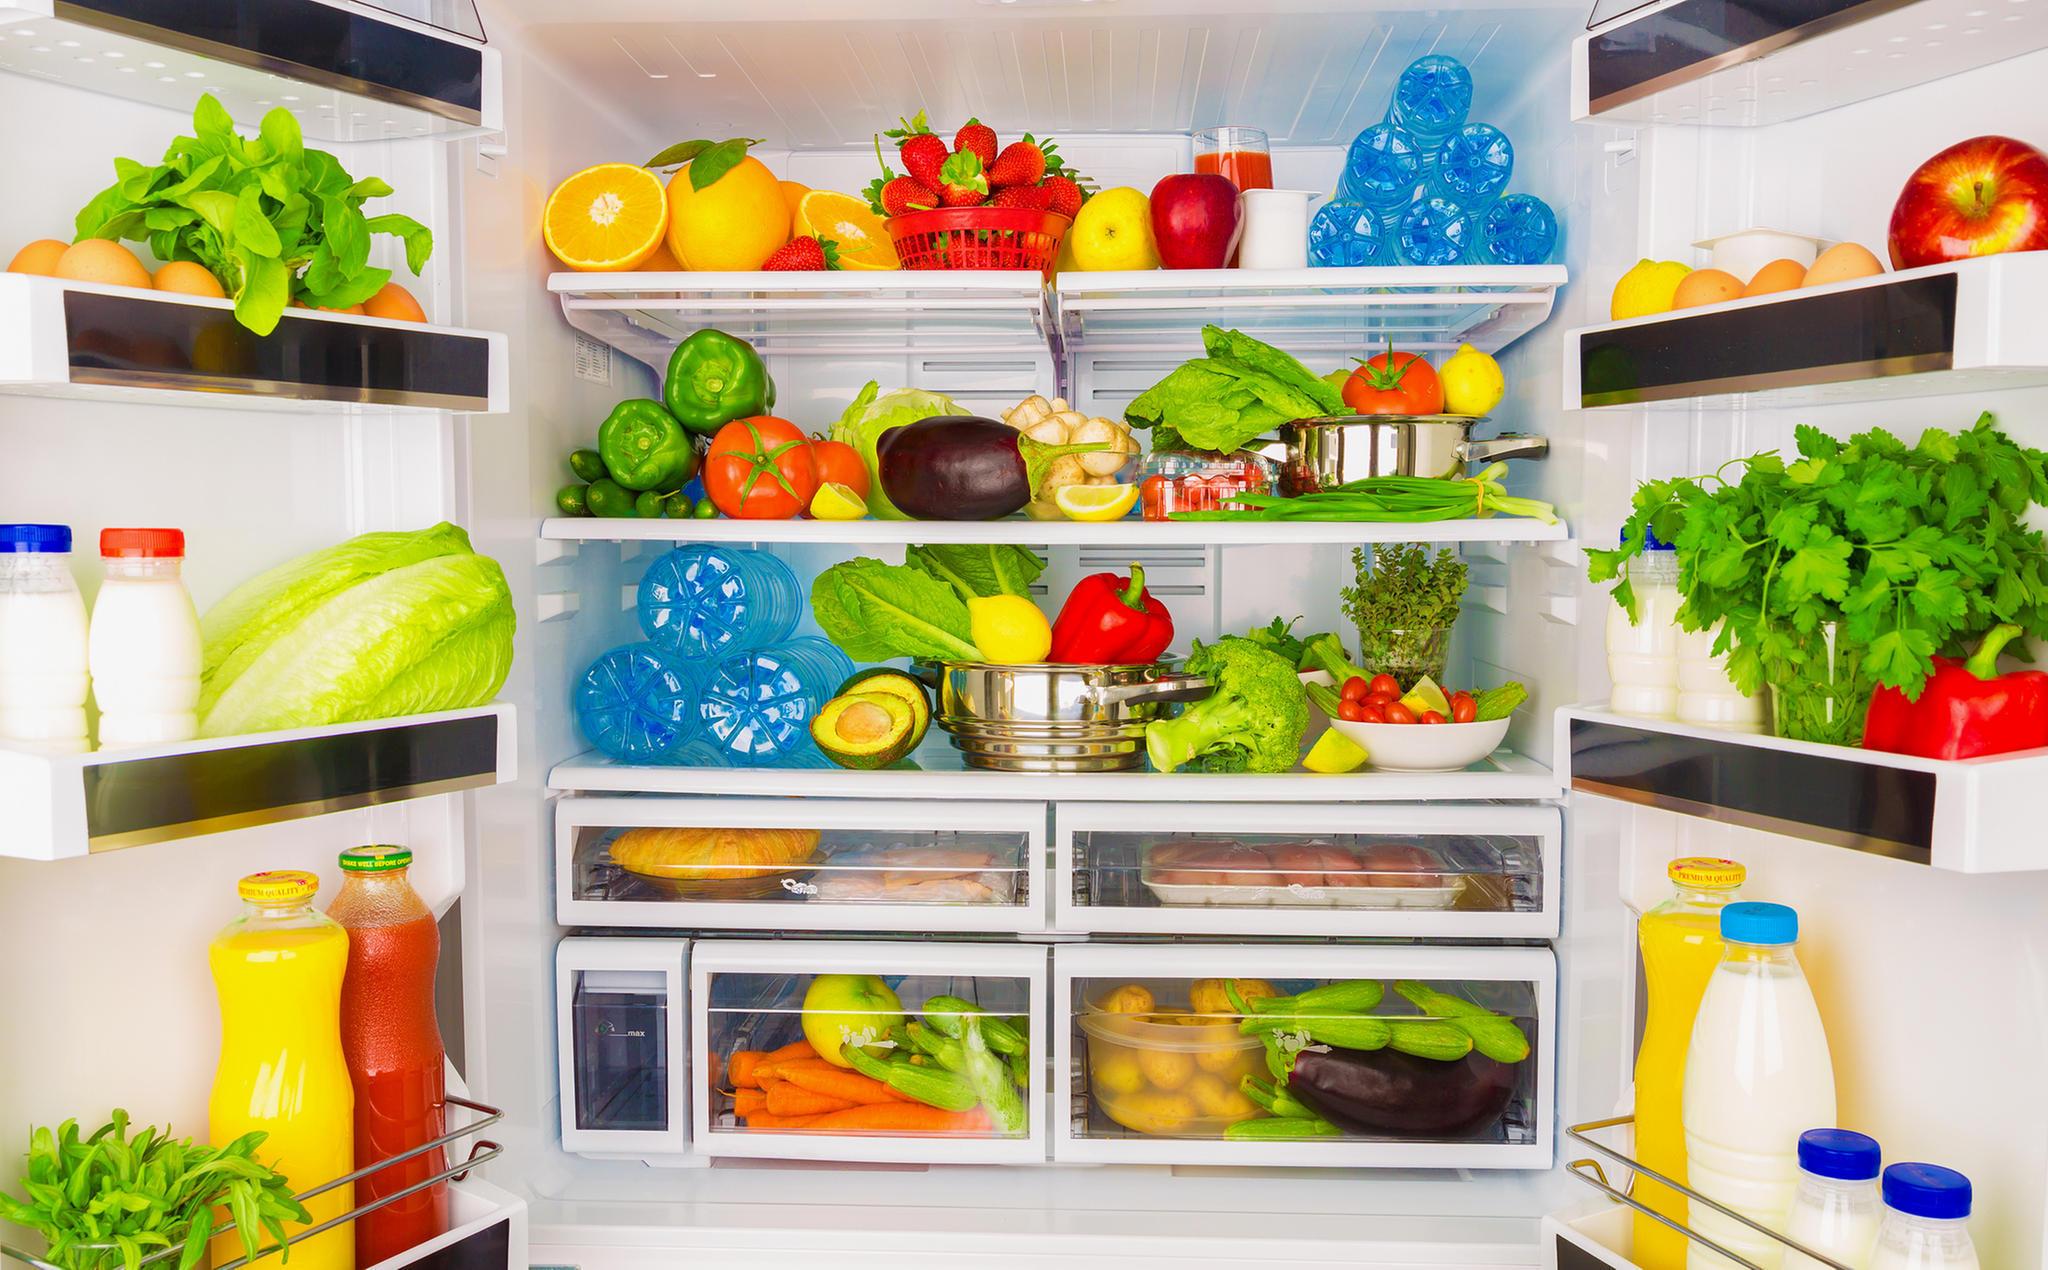 Aldi Kühlschrank Unterbaufähig : Aldi kühlschrank unterbaufähig cooles aldi angebot kühlschrank